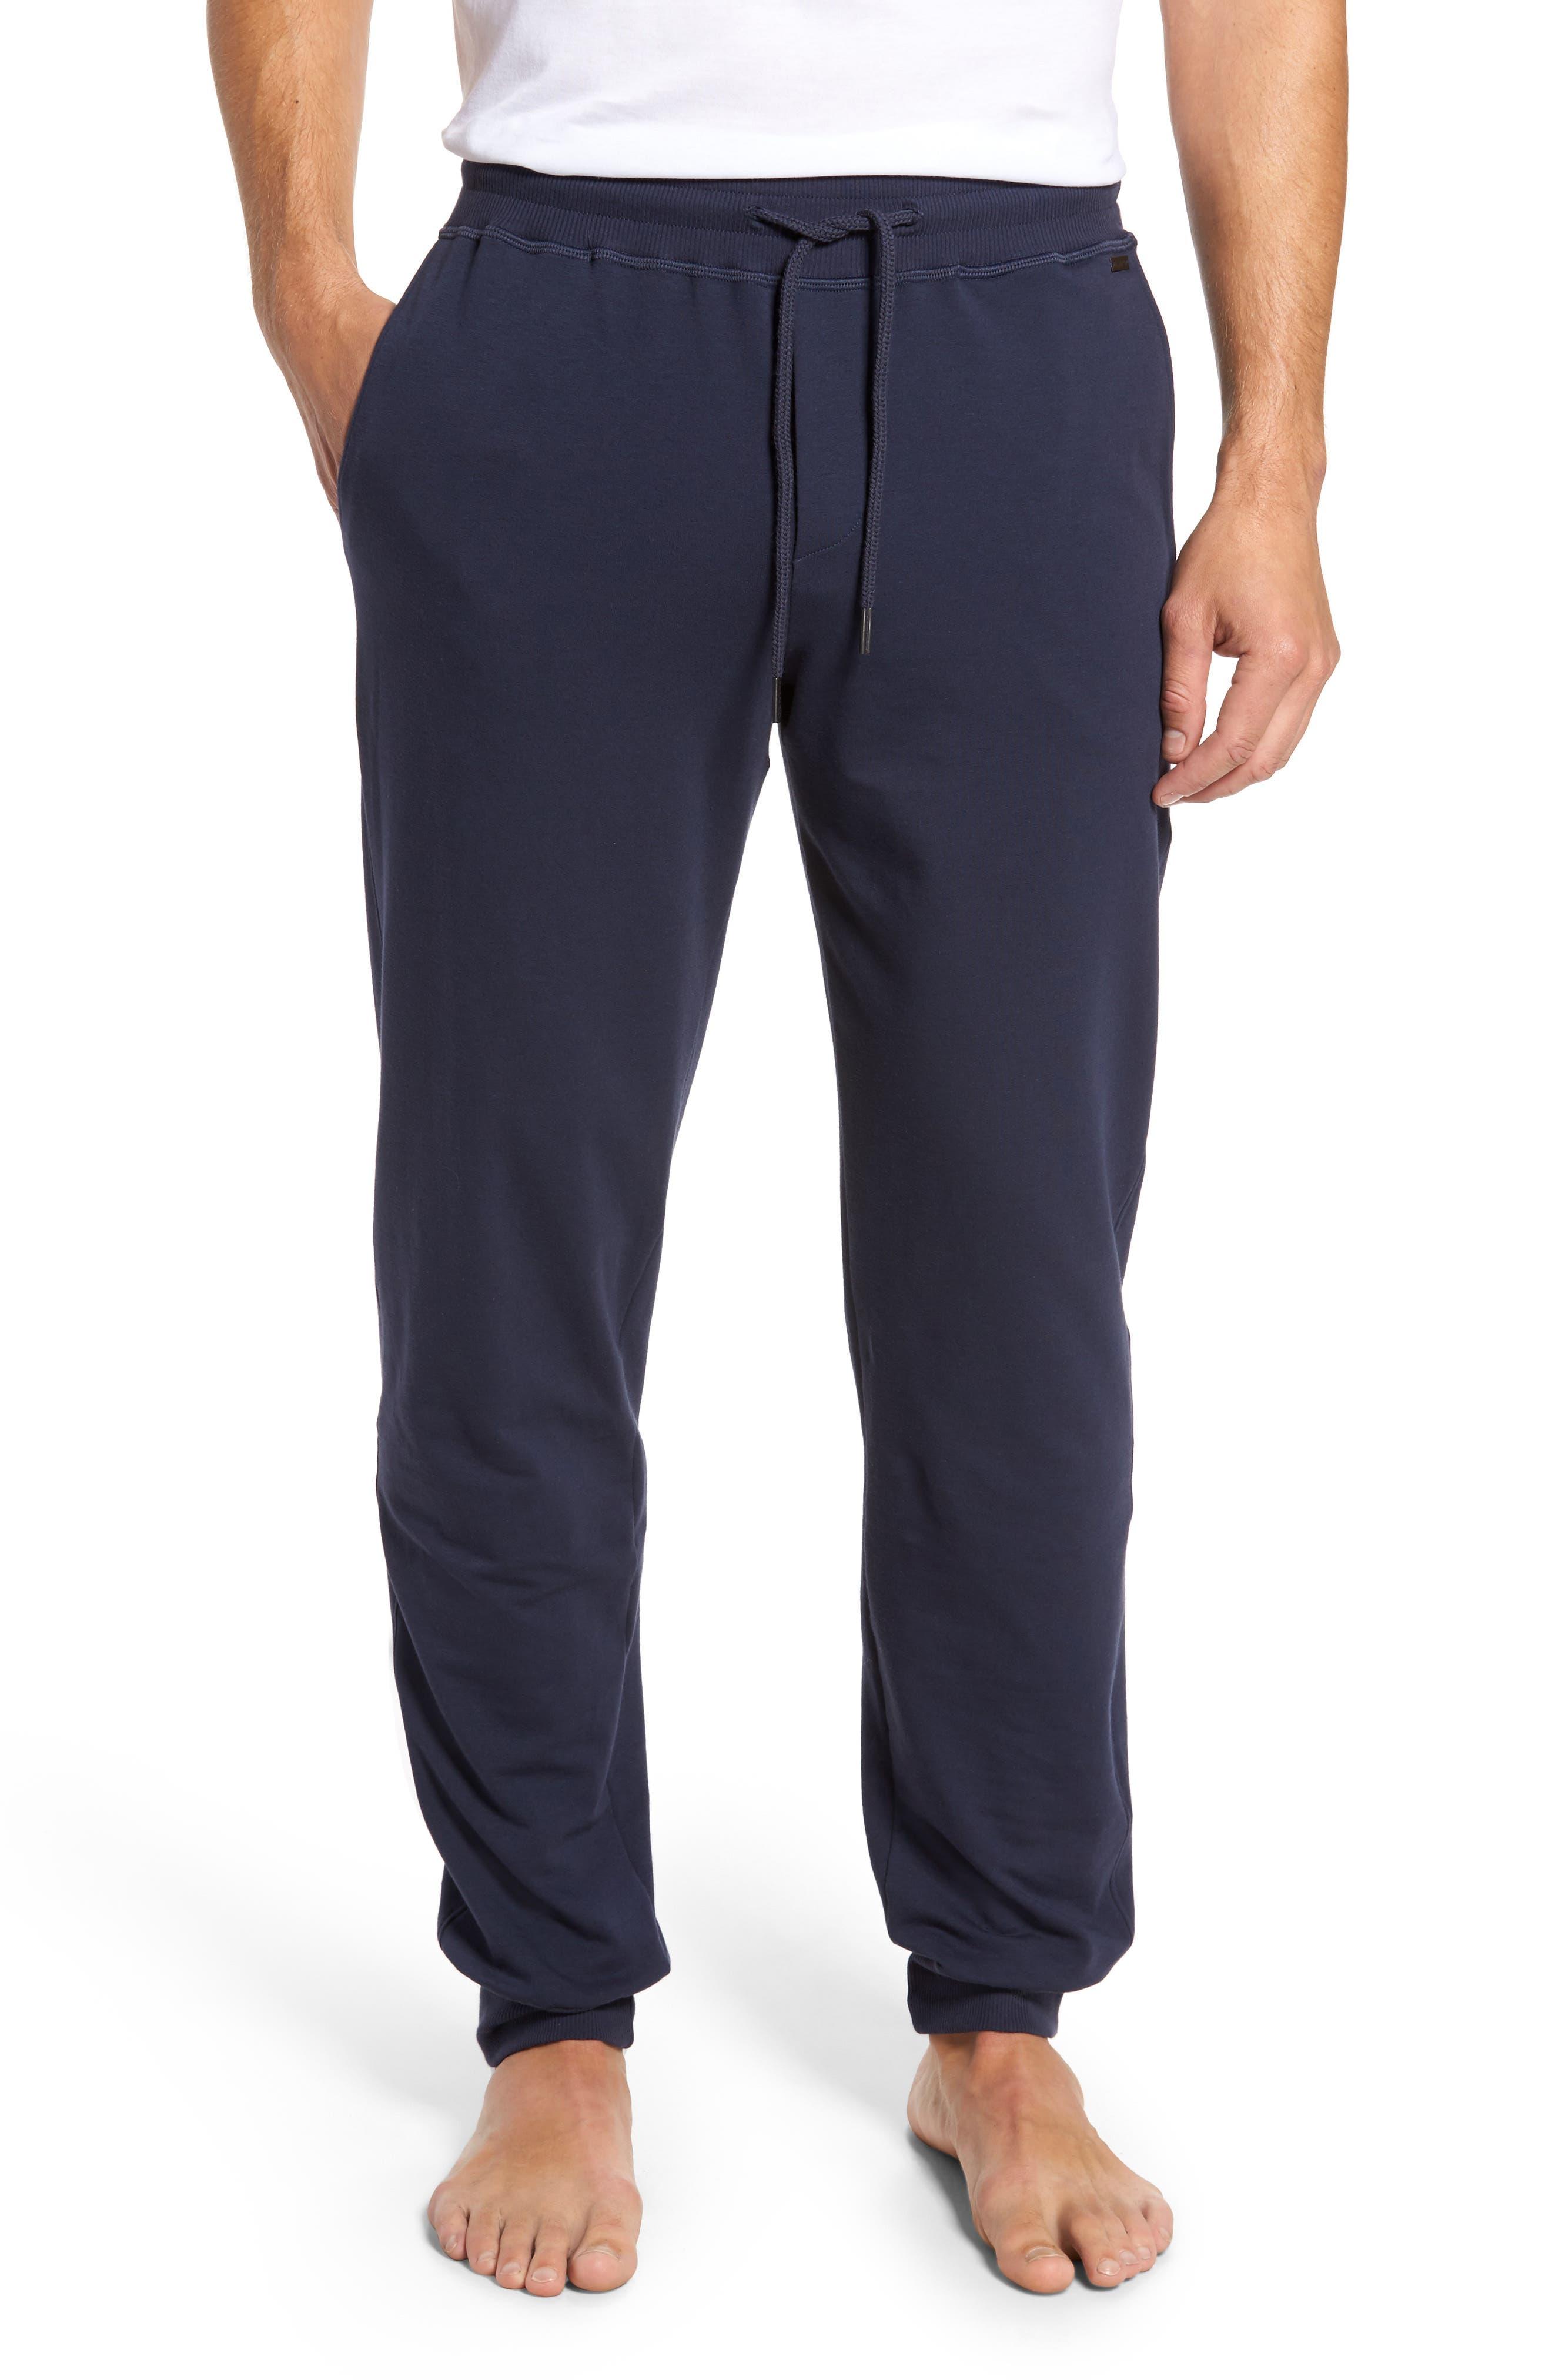 Living Lounge Pants,                         Main,                         color, BLACK IRIS